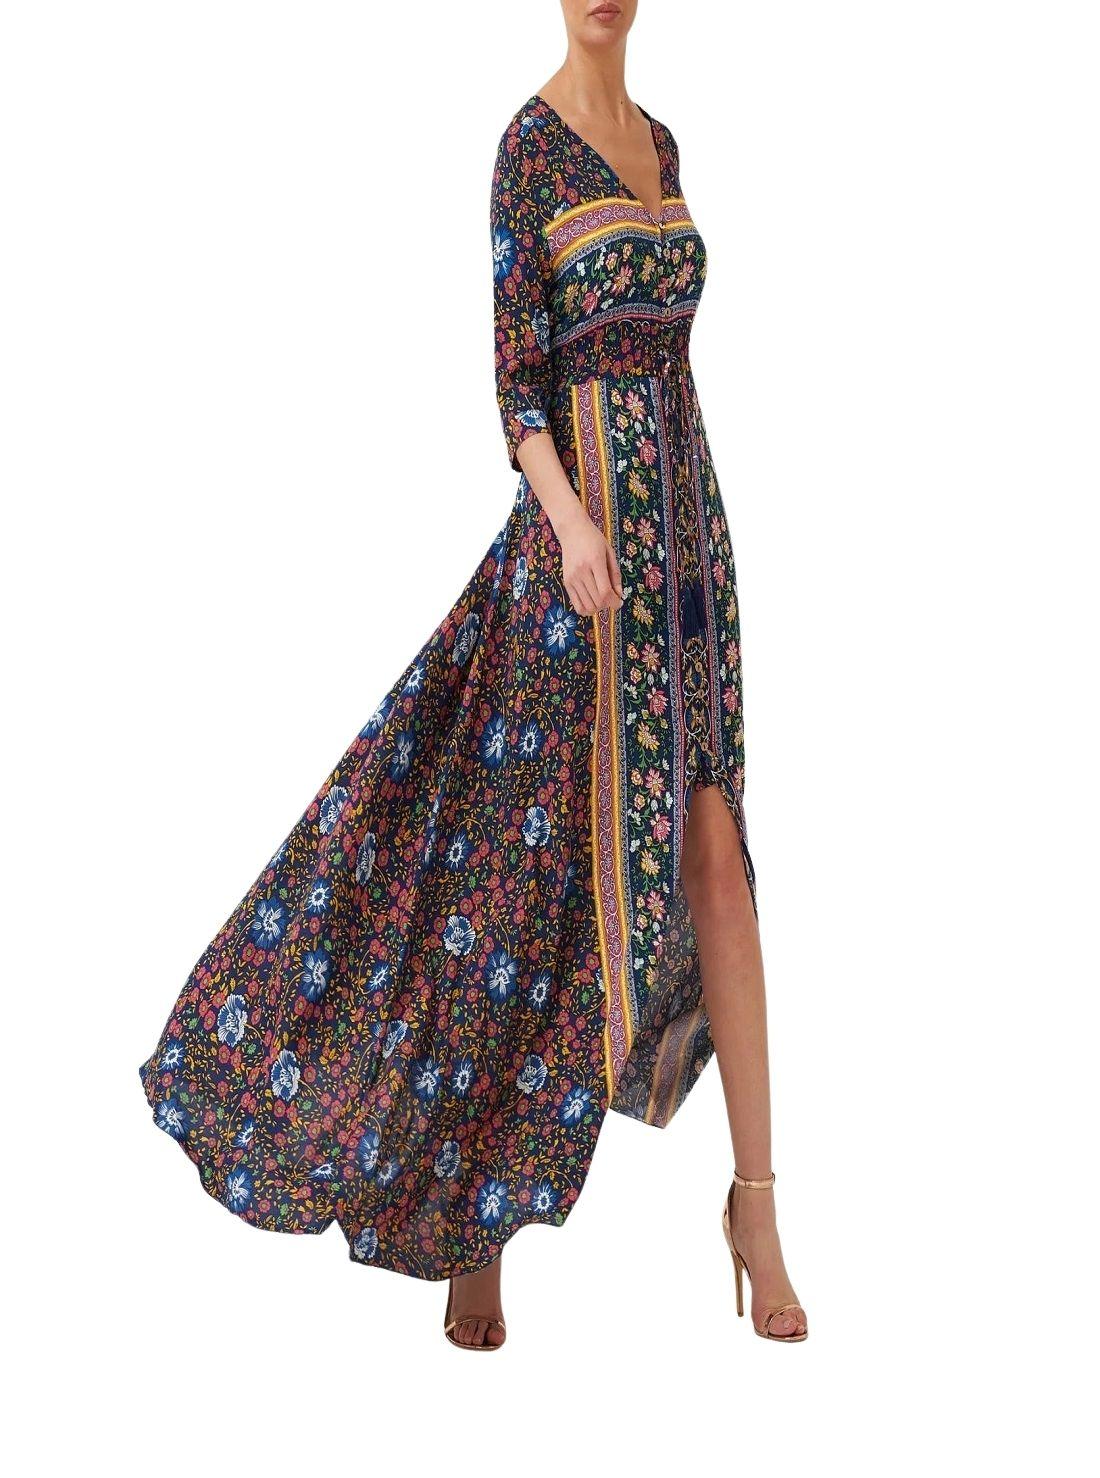 Wholesale Navy Floral Print Boho Dress (1)